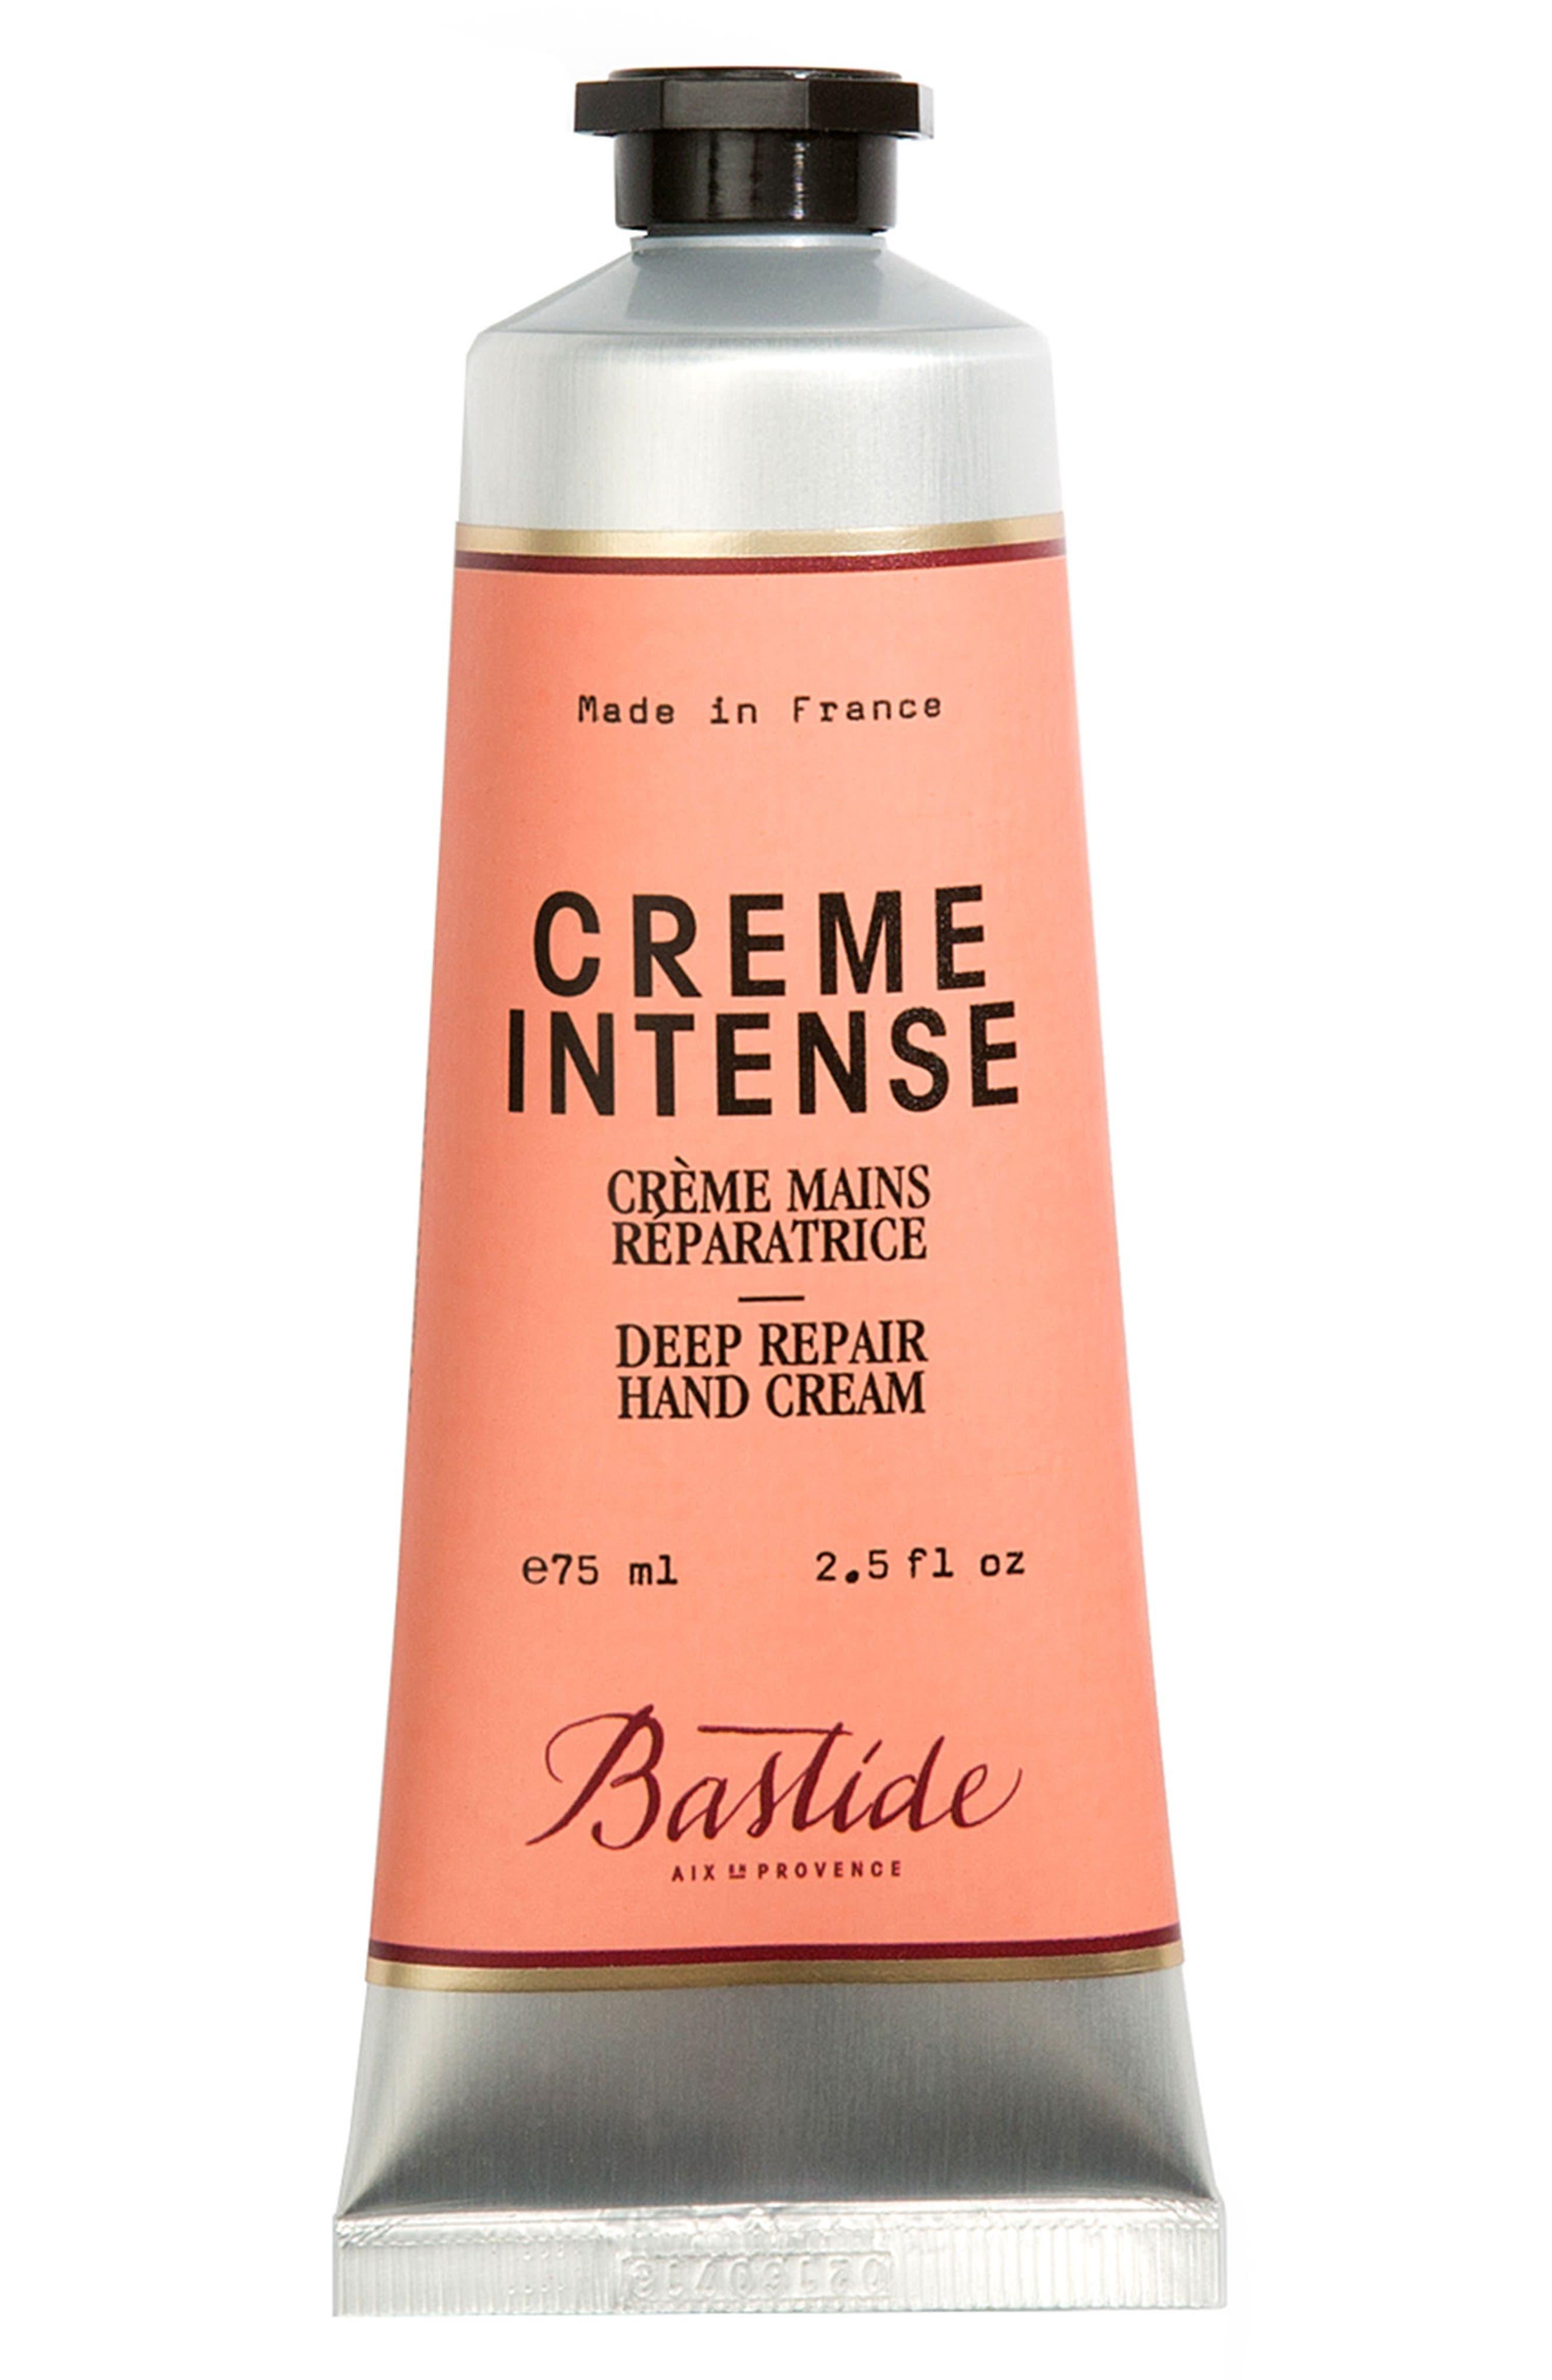 Bastide Creme Intense Deep Repair Hand Cream